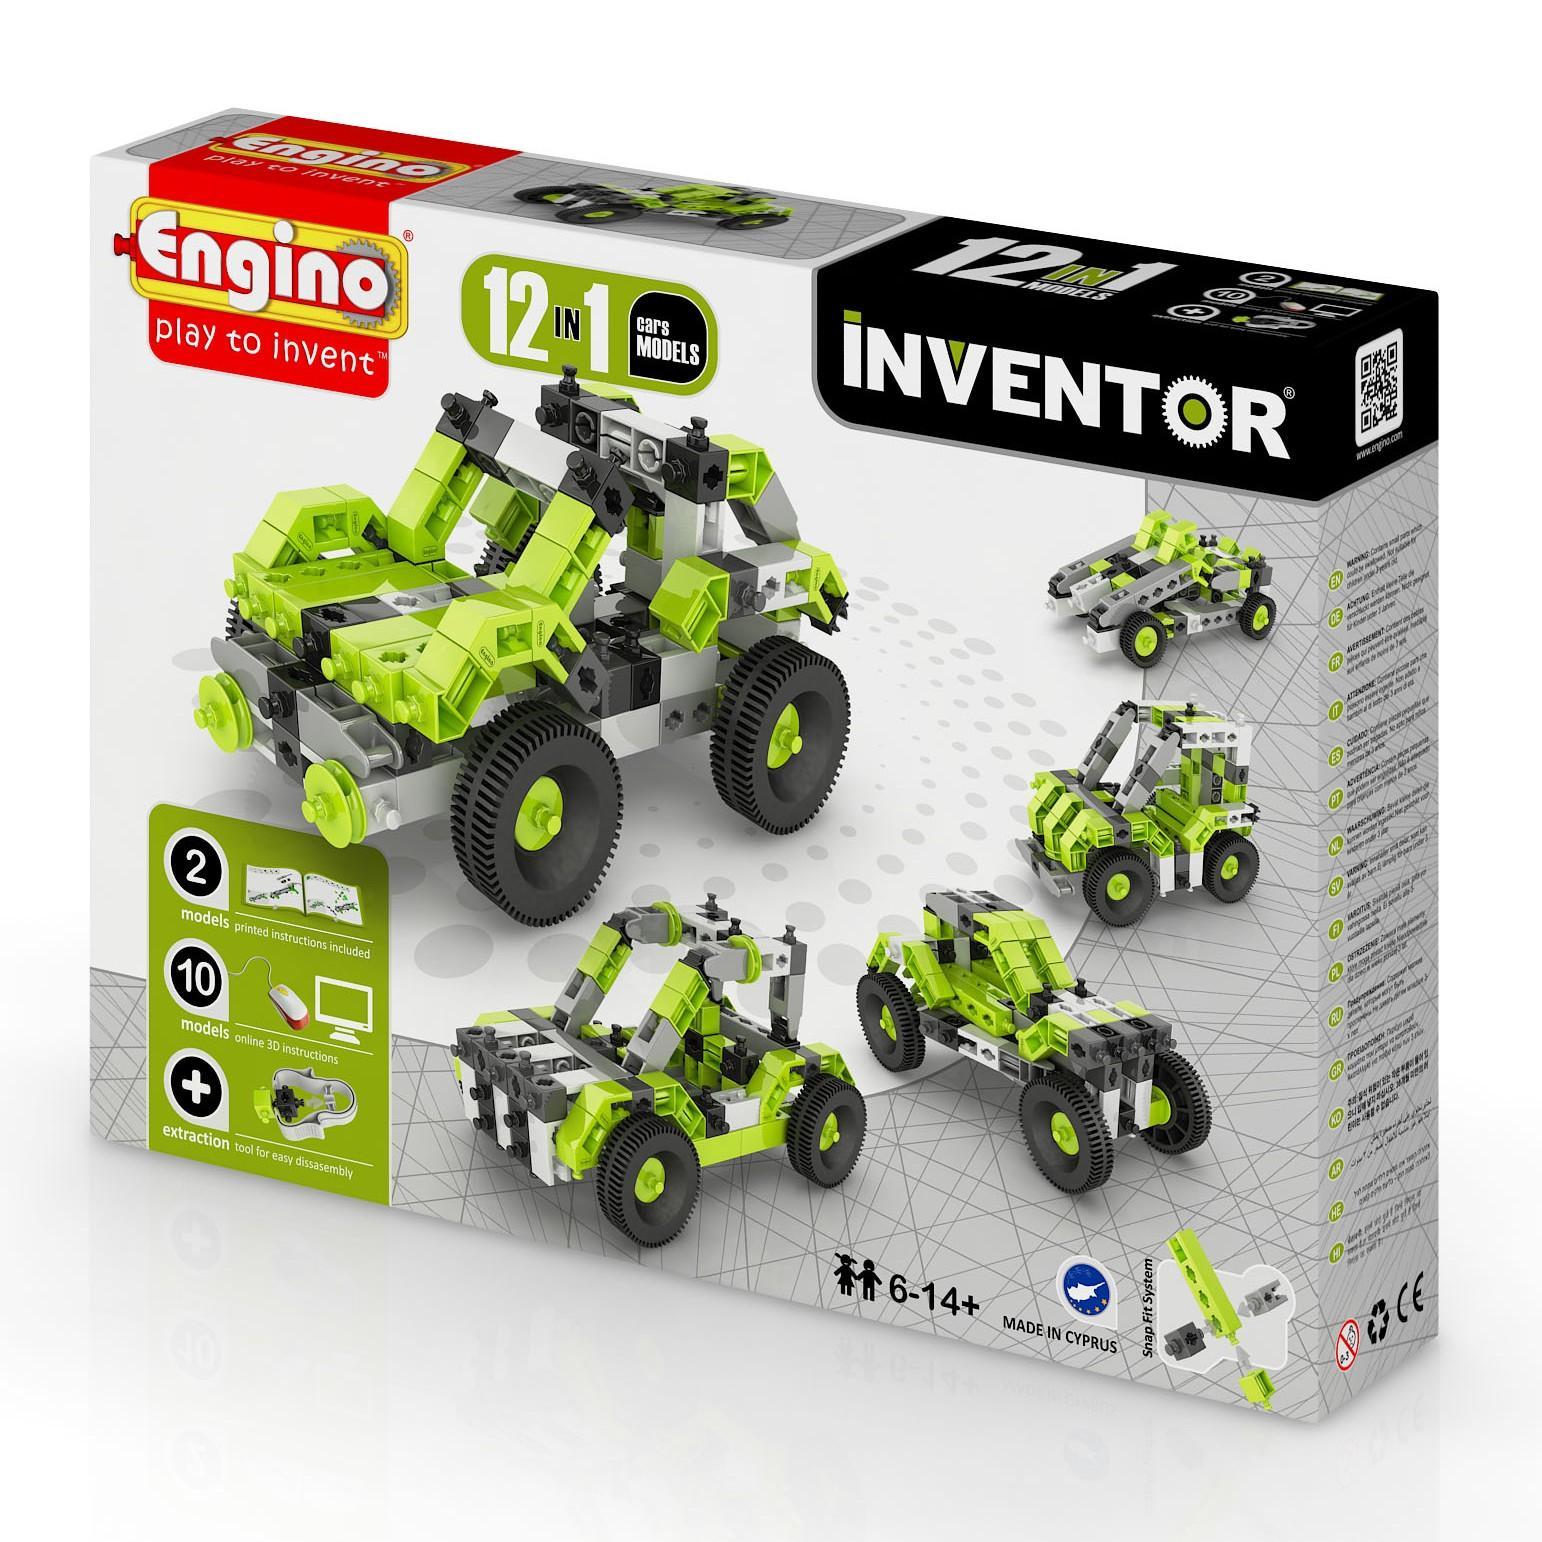 ENGINO INVENTOR 12 MODELS CARS  094158